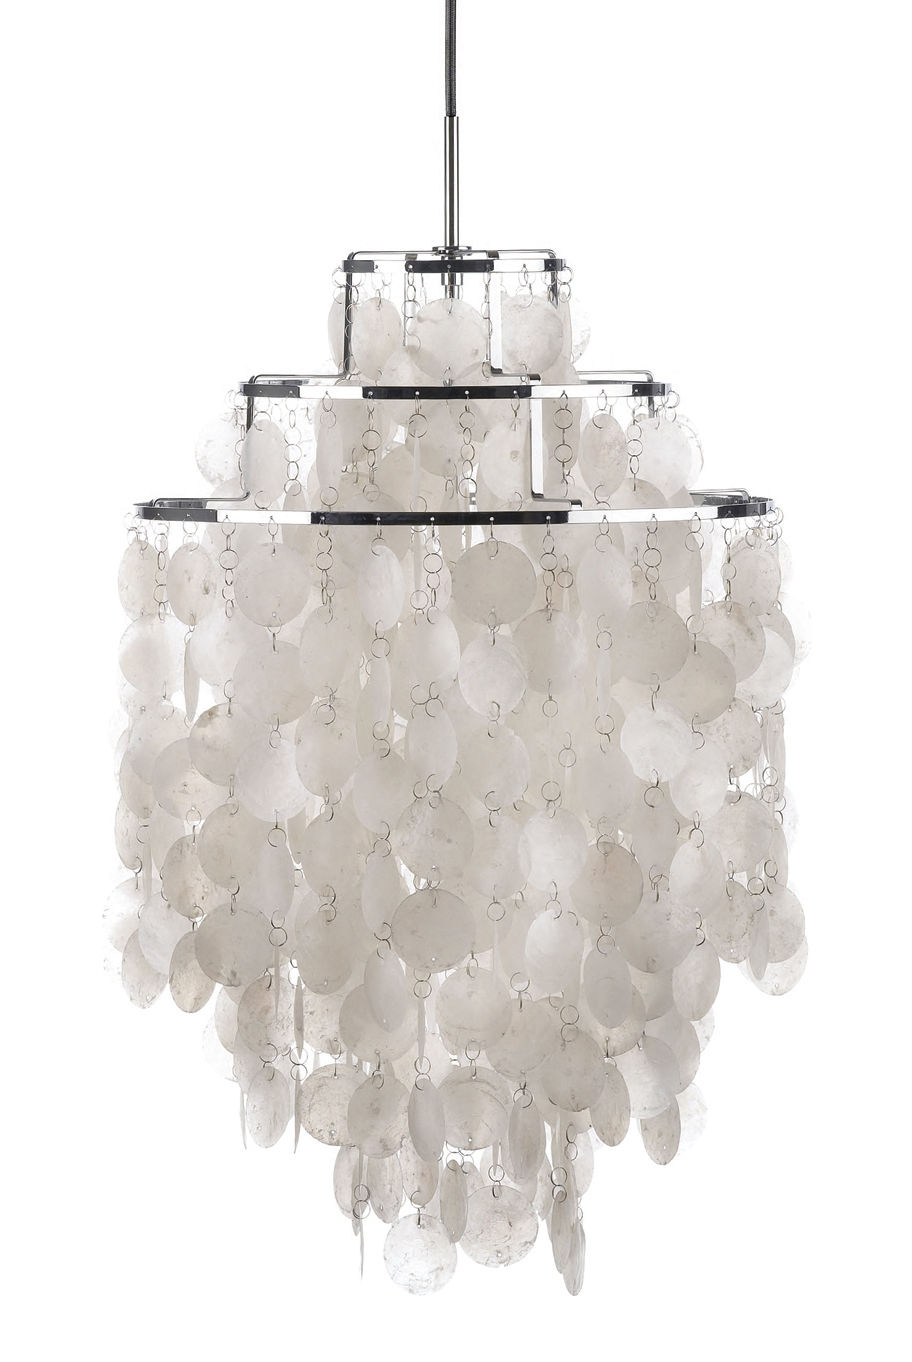 Illuminazione - Lampadari - Sospensione Fun 1DM - Ø 45 cm - Panton 1964 di Verpan - Ø 45 cm - Madreperla e acciaio cromato - Madreperla, Metallo